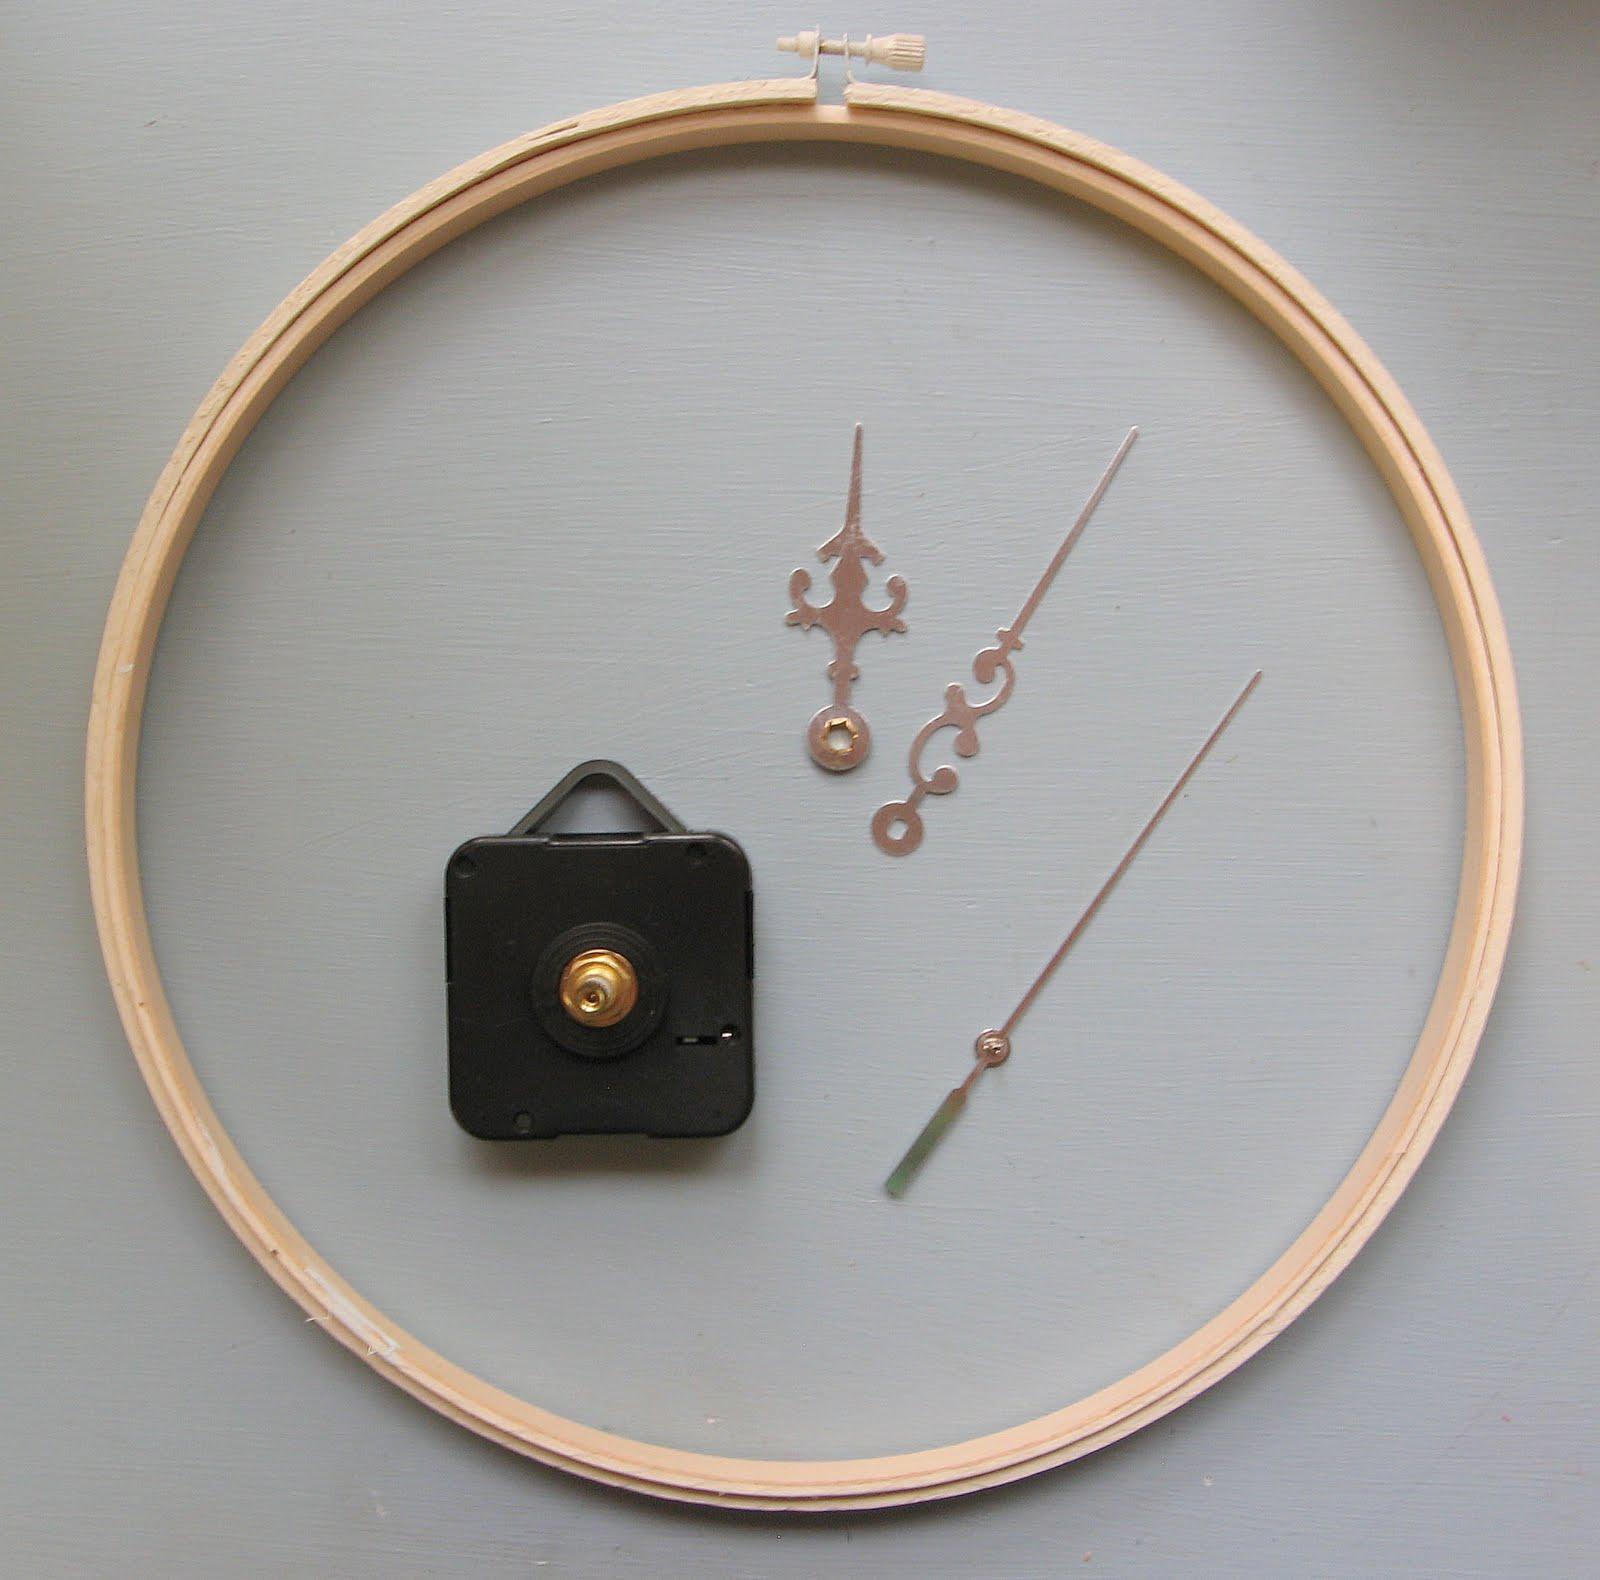 Carolina country living embroidery hoop doily clock tutorial